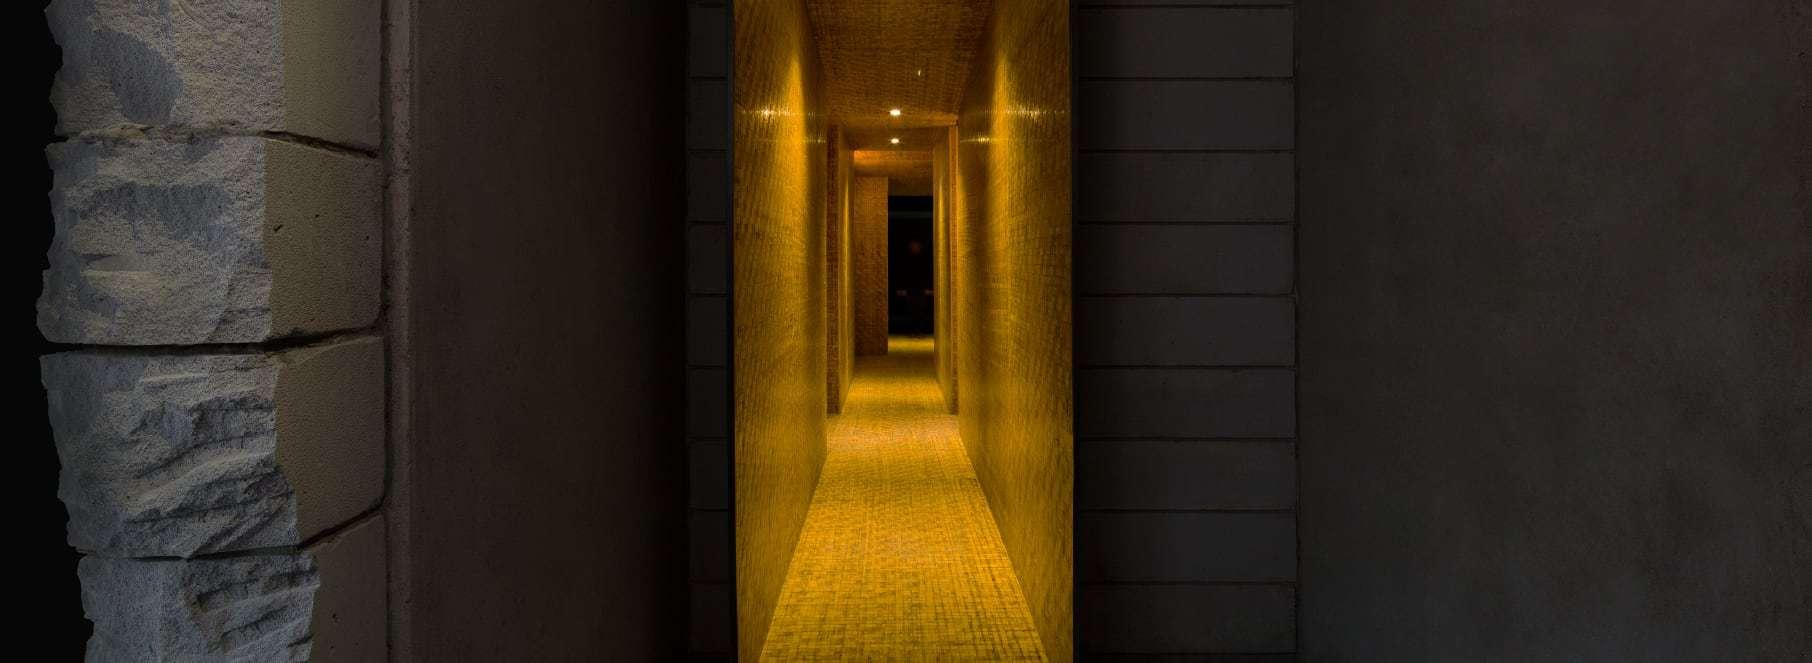 infinite nide bamboo concrete office changsha 1